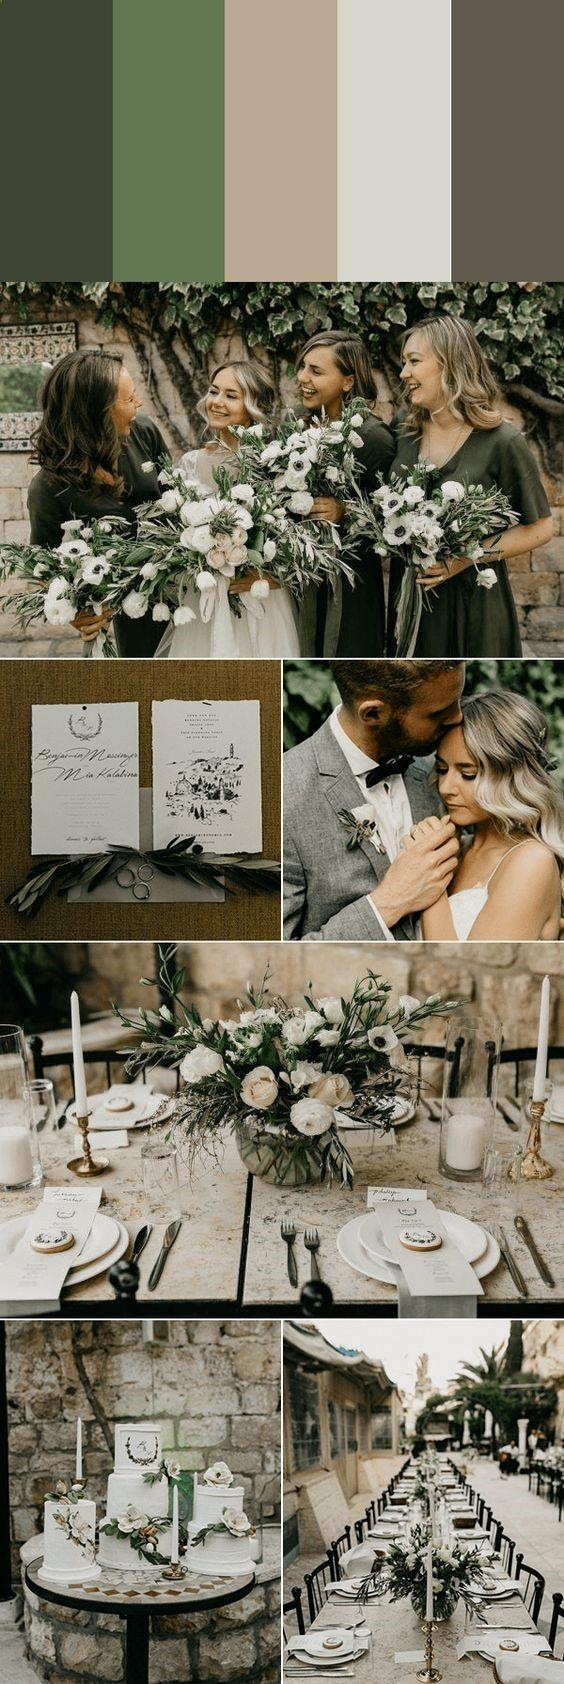 12 Nontraditional Wedding Ideas Wedding Pinterest